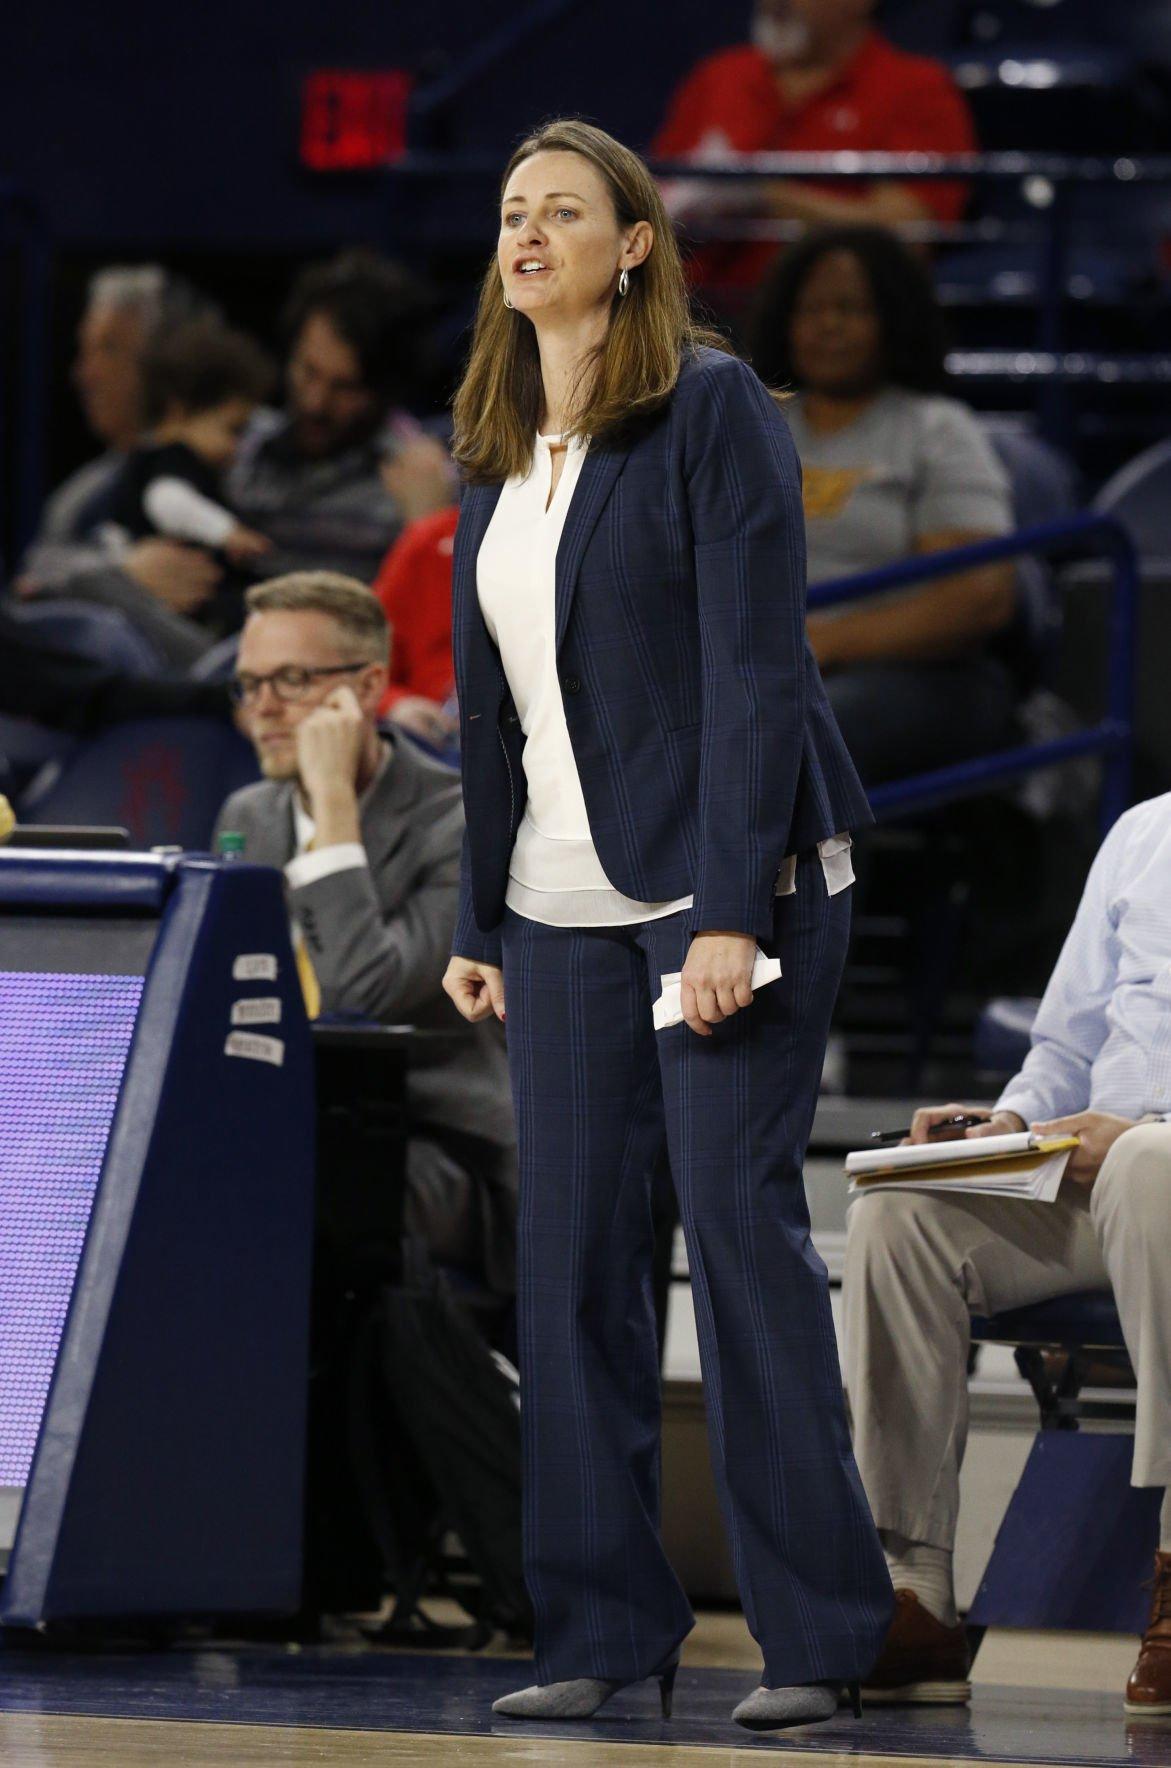 UR vs. VCU women's basketball